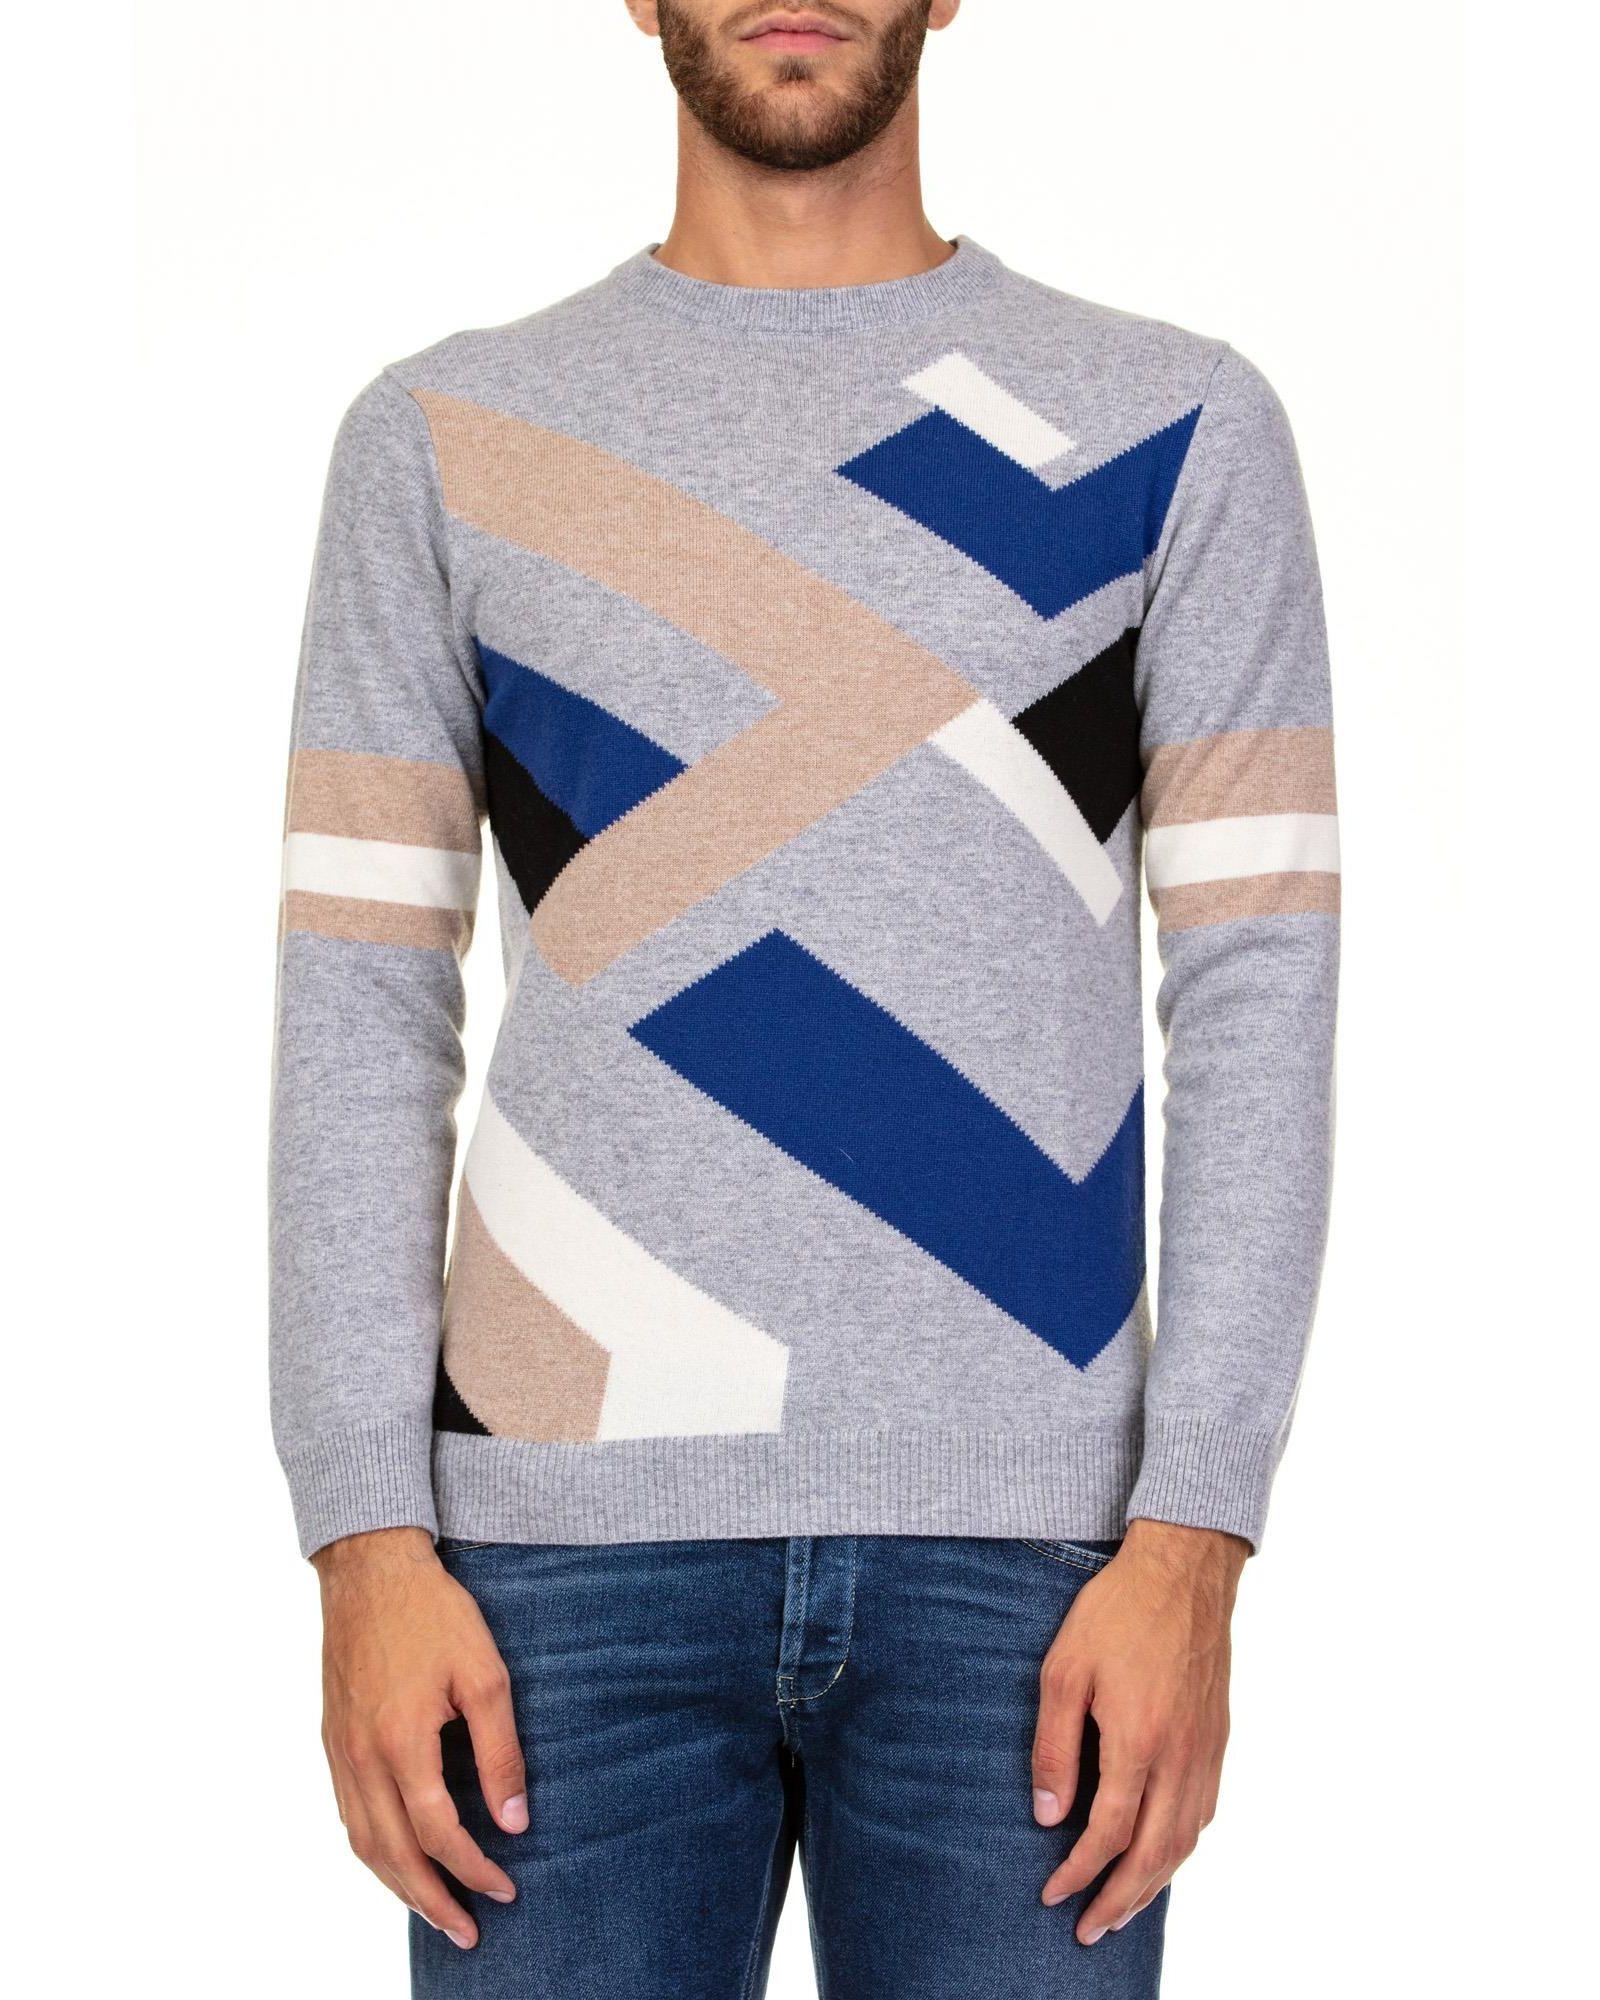 DANIELE FIESOLI Extrafine Merino Wool T-Shirt in Grey